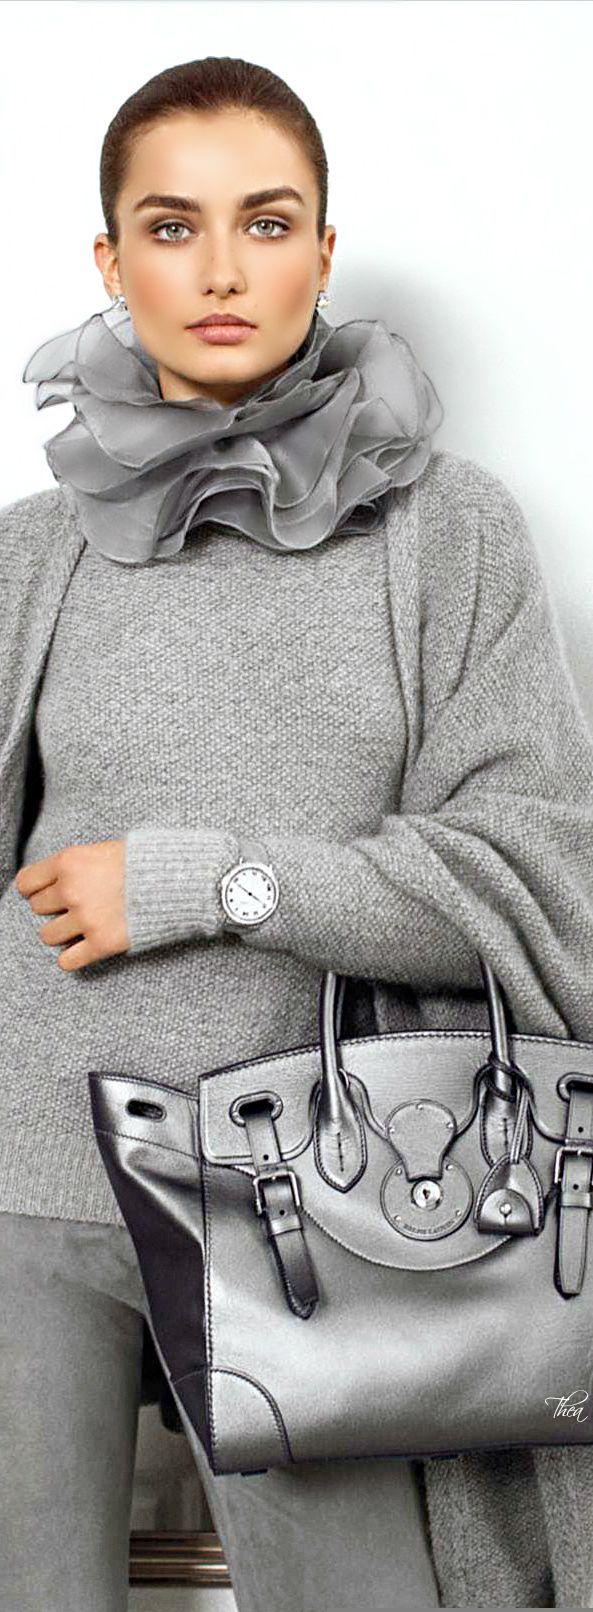 Ralph Lauren from head to toe. Notice the grey strap on the Ralph Lauren watch?